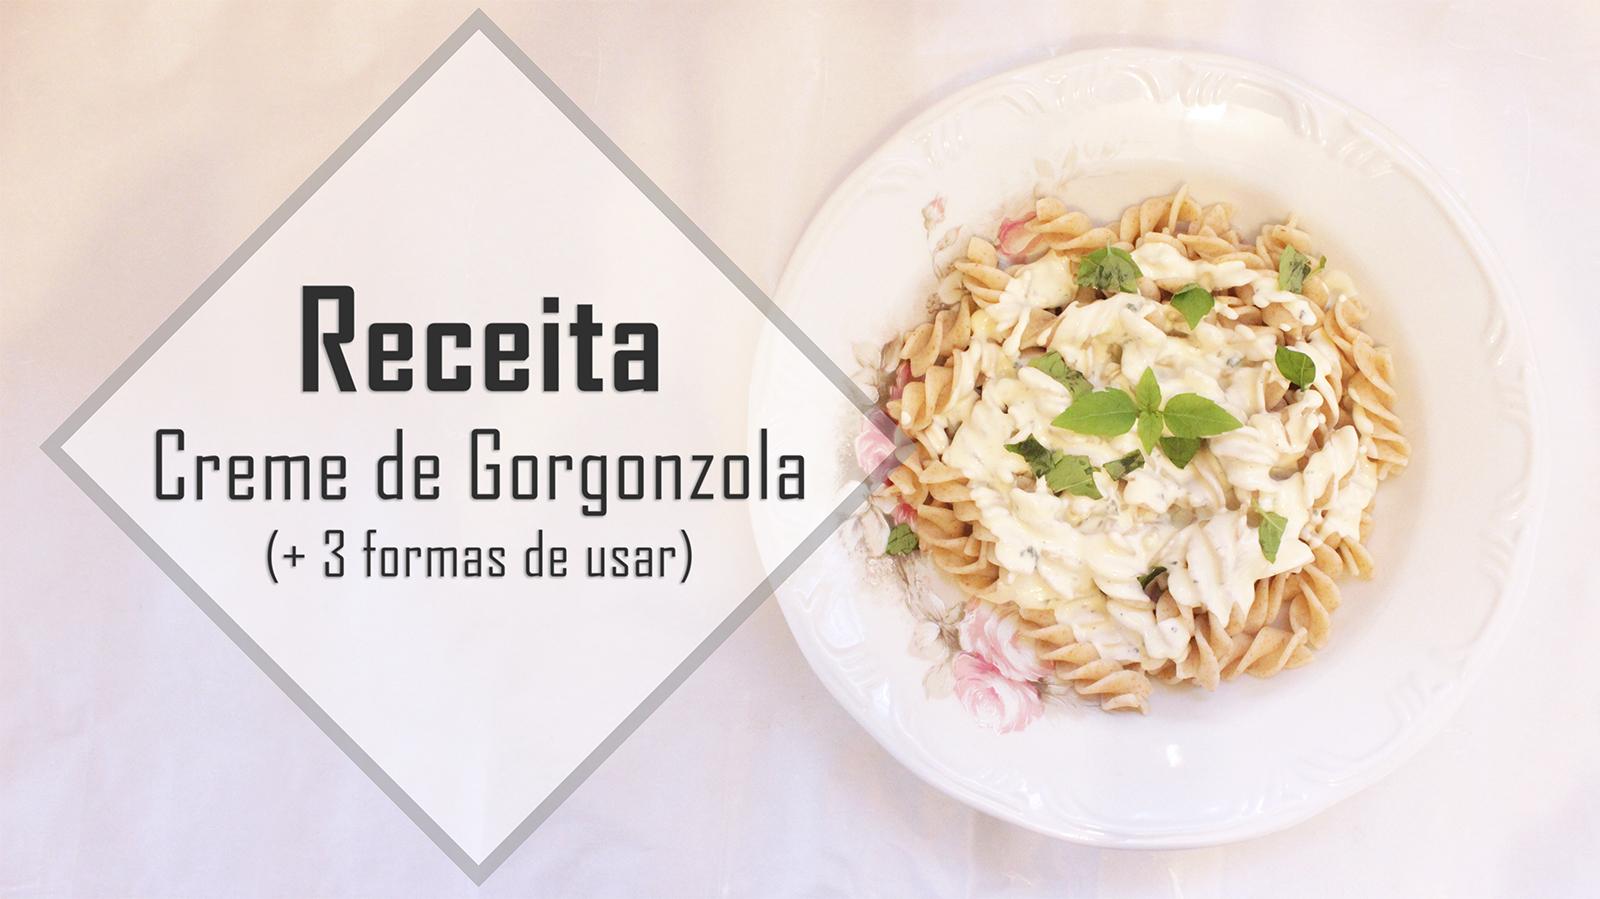 Receita Creme de Gorgonzola + 3 formas de usar